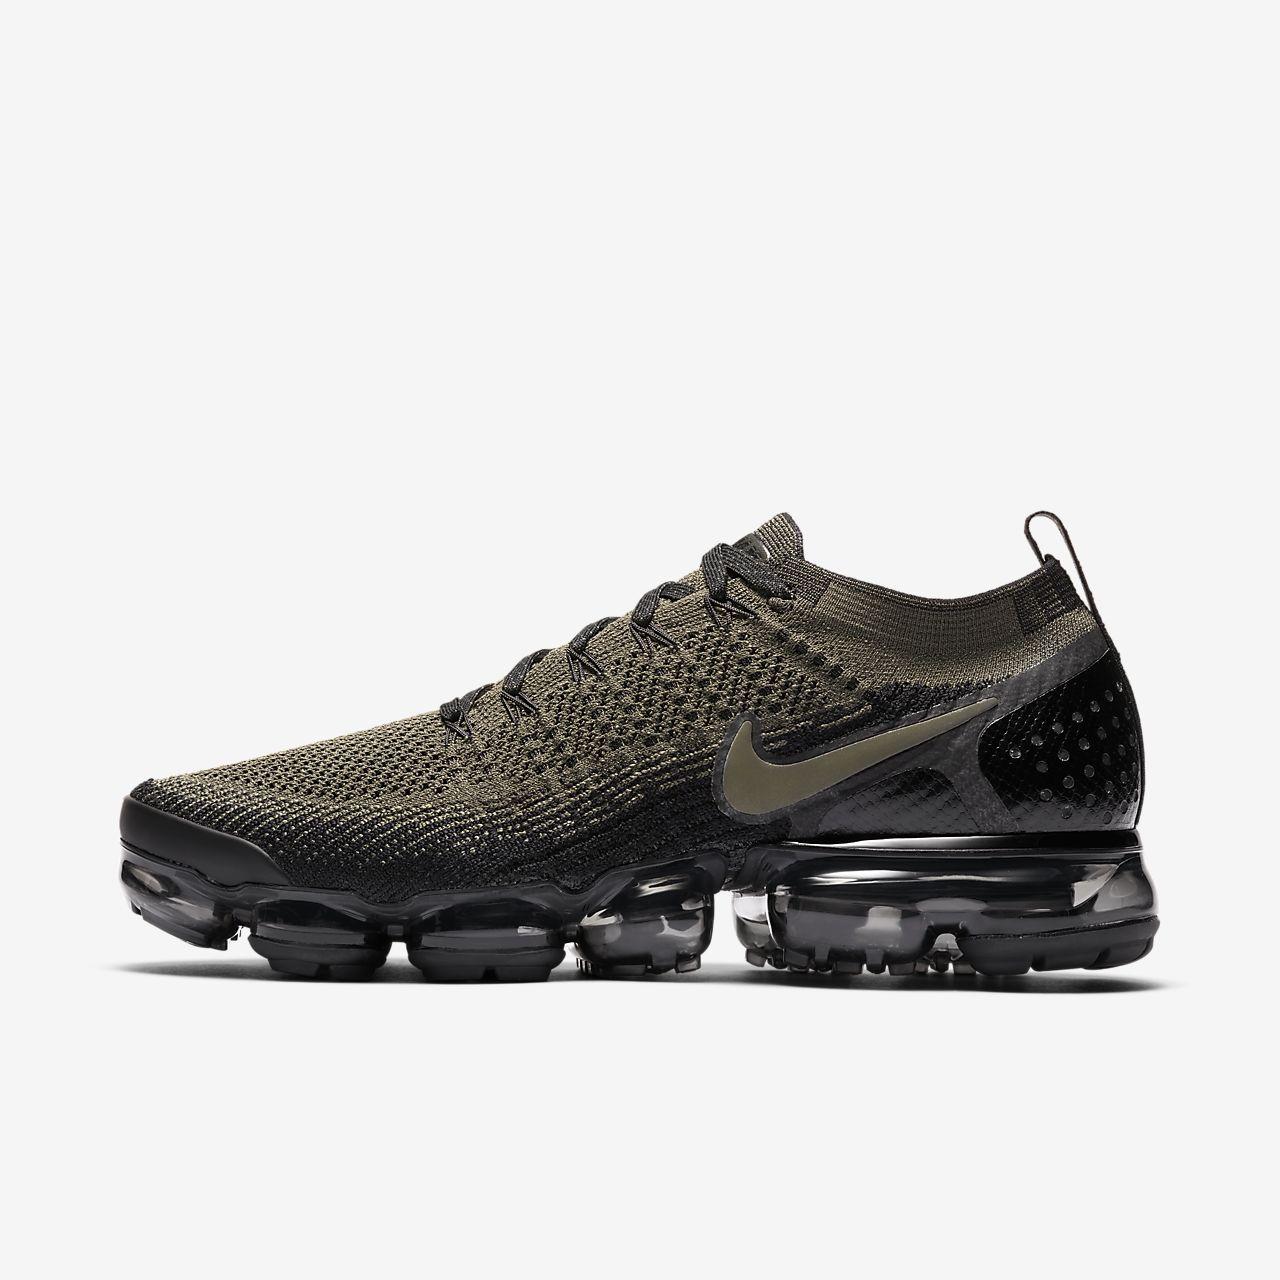 release date: aa8d6 4e69a 2 Ch Vapormax Homme Air Chaussure Nike Pour Flyknit Qtnhxwpc Snake fTxwHnn